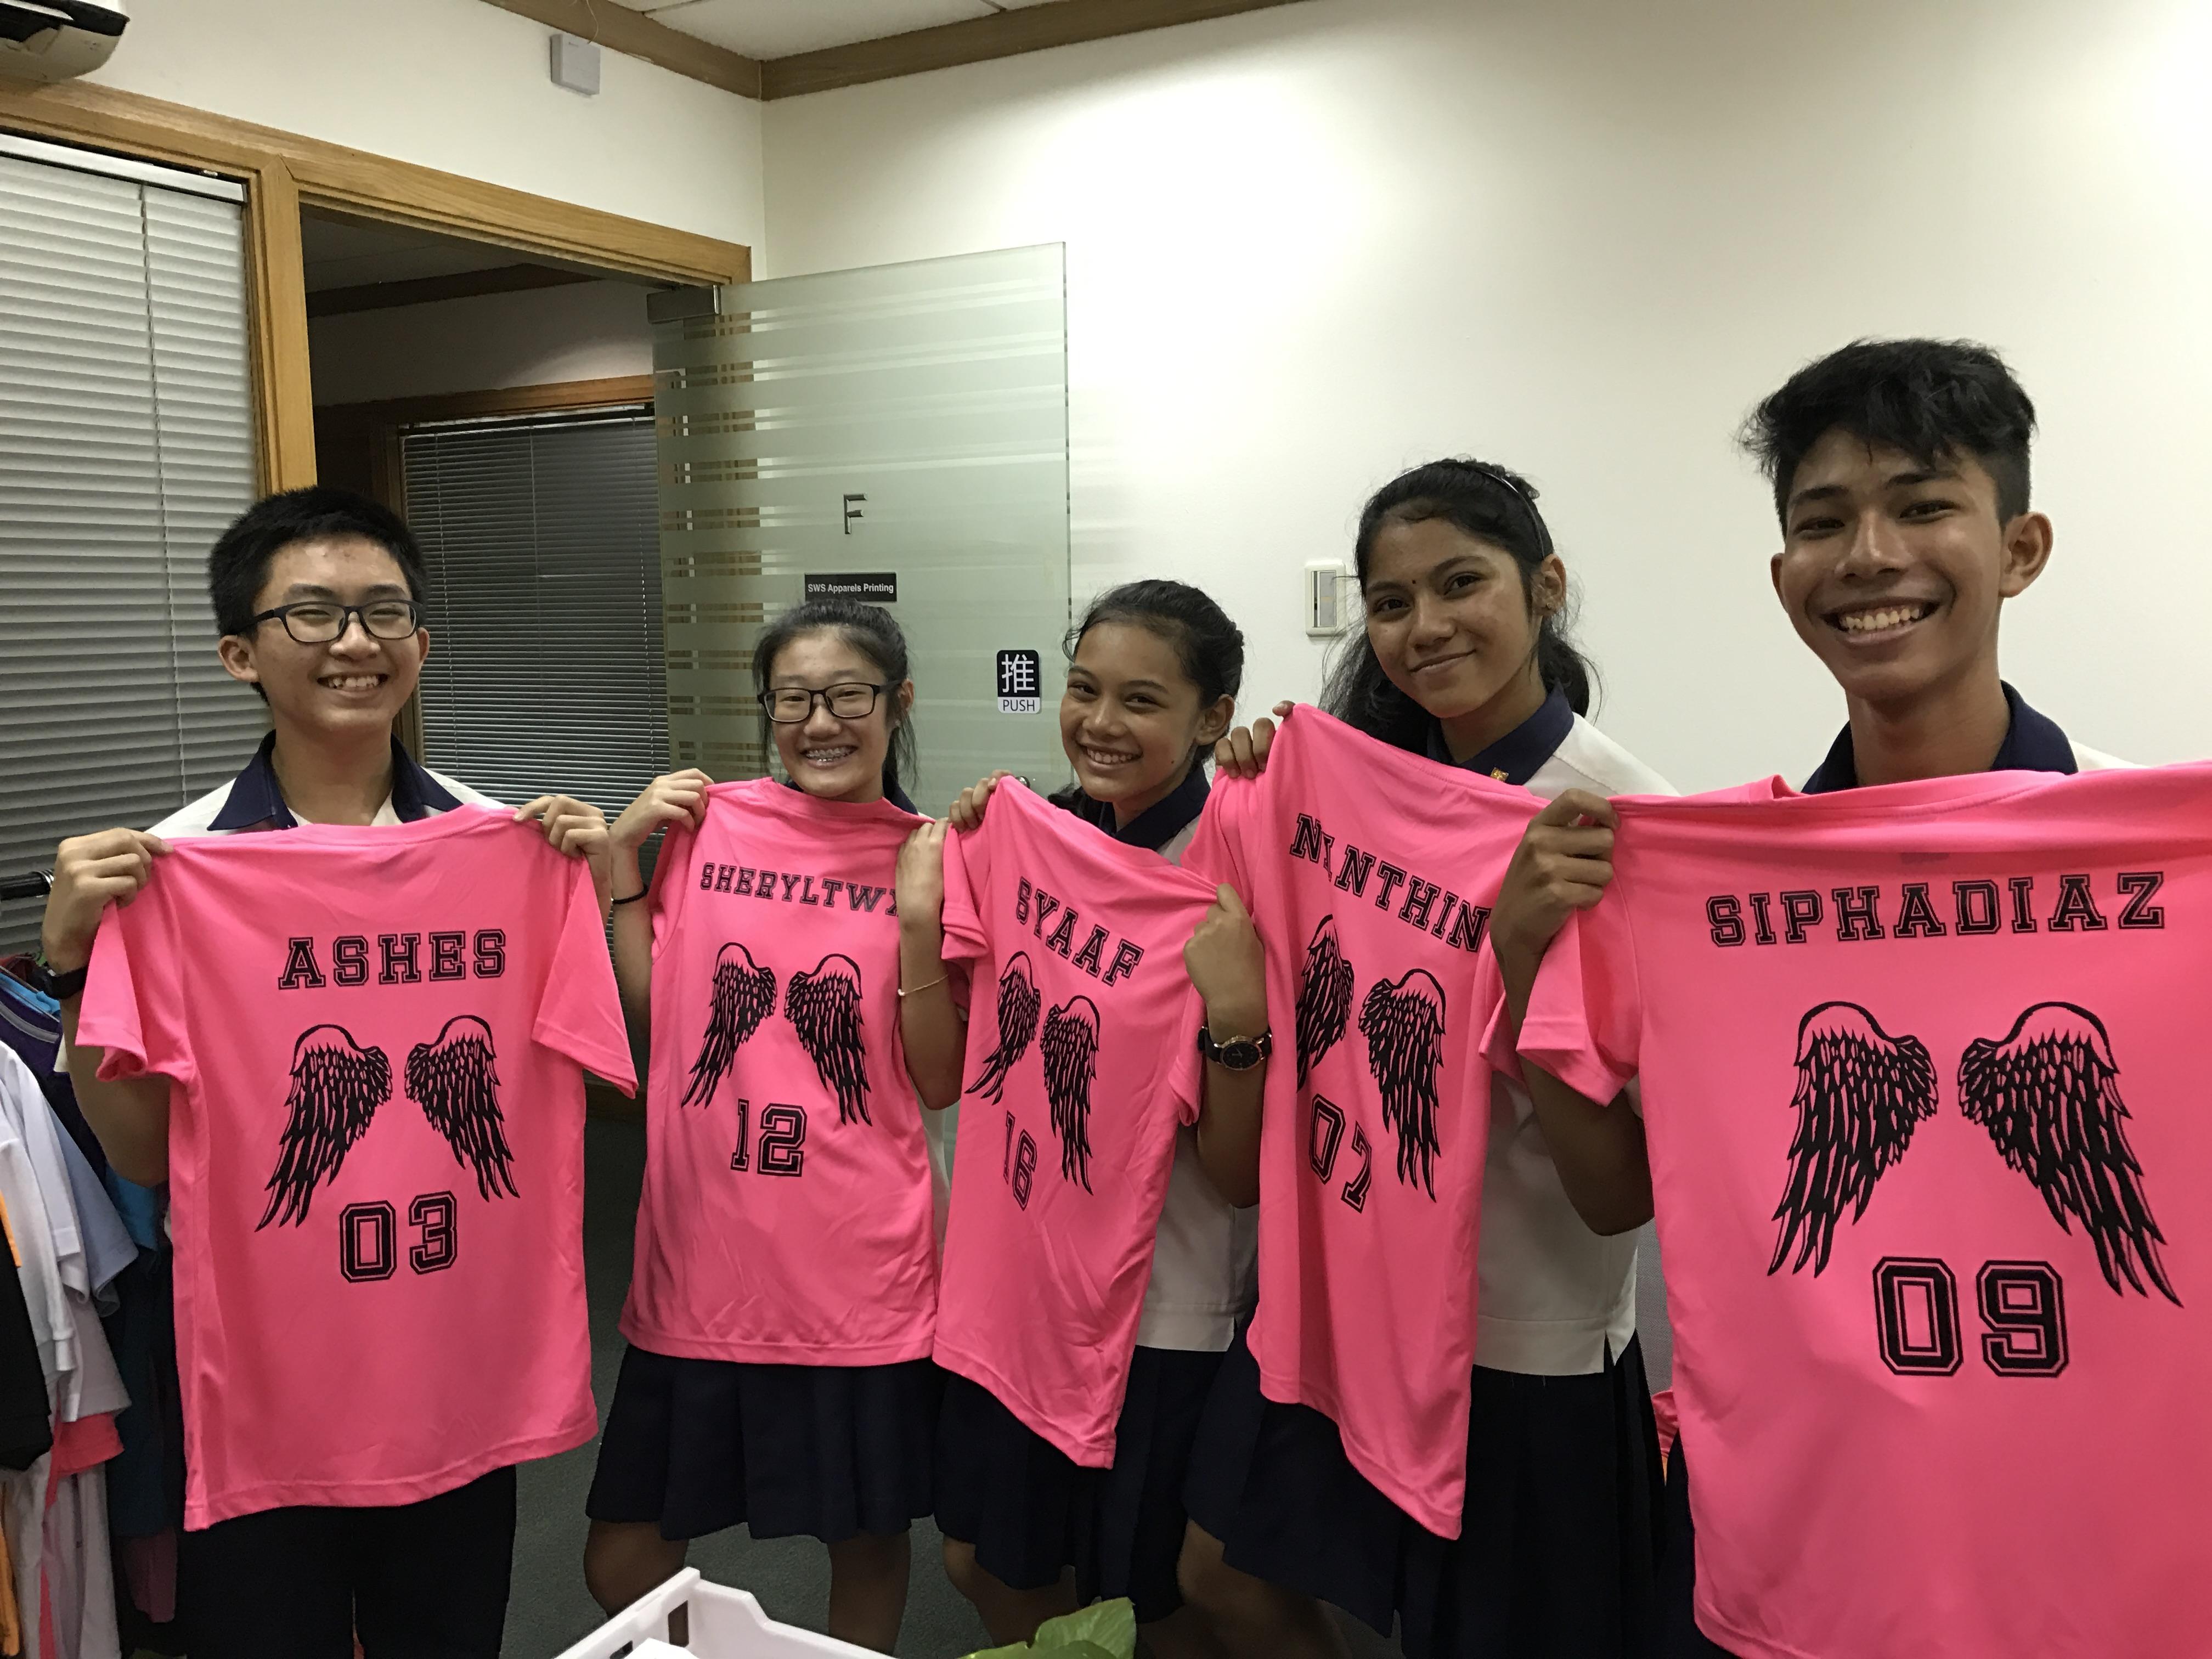 Class T Shirt Printing T Shirt Printing Singapore Singapore